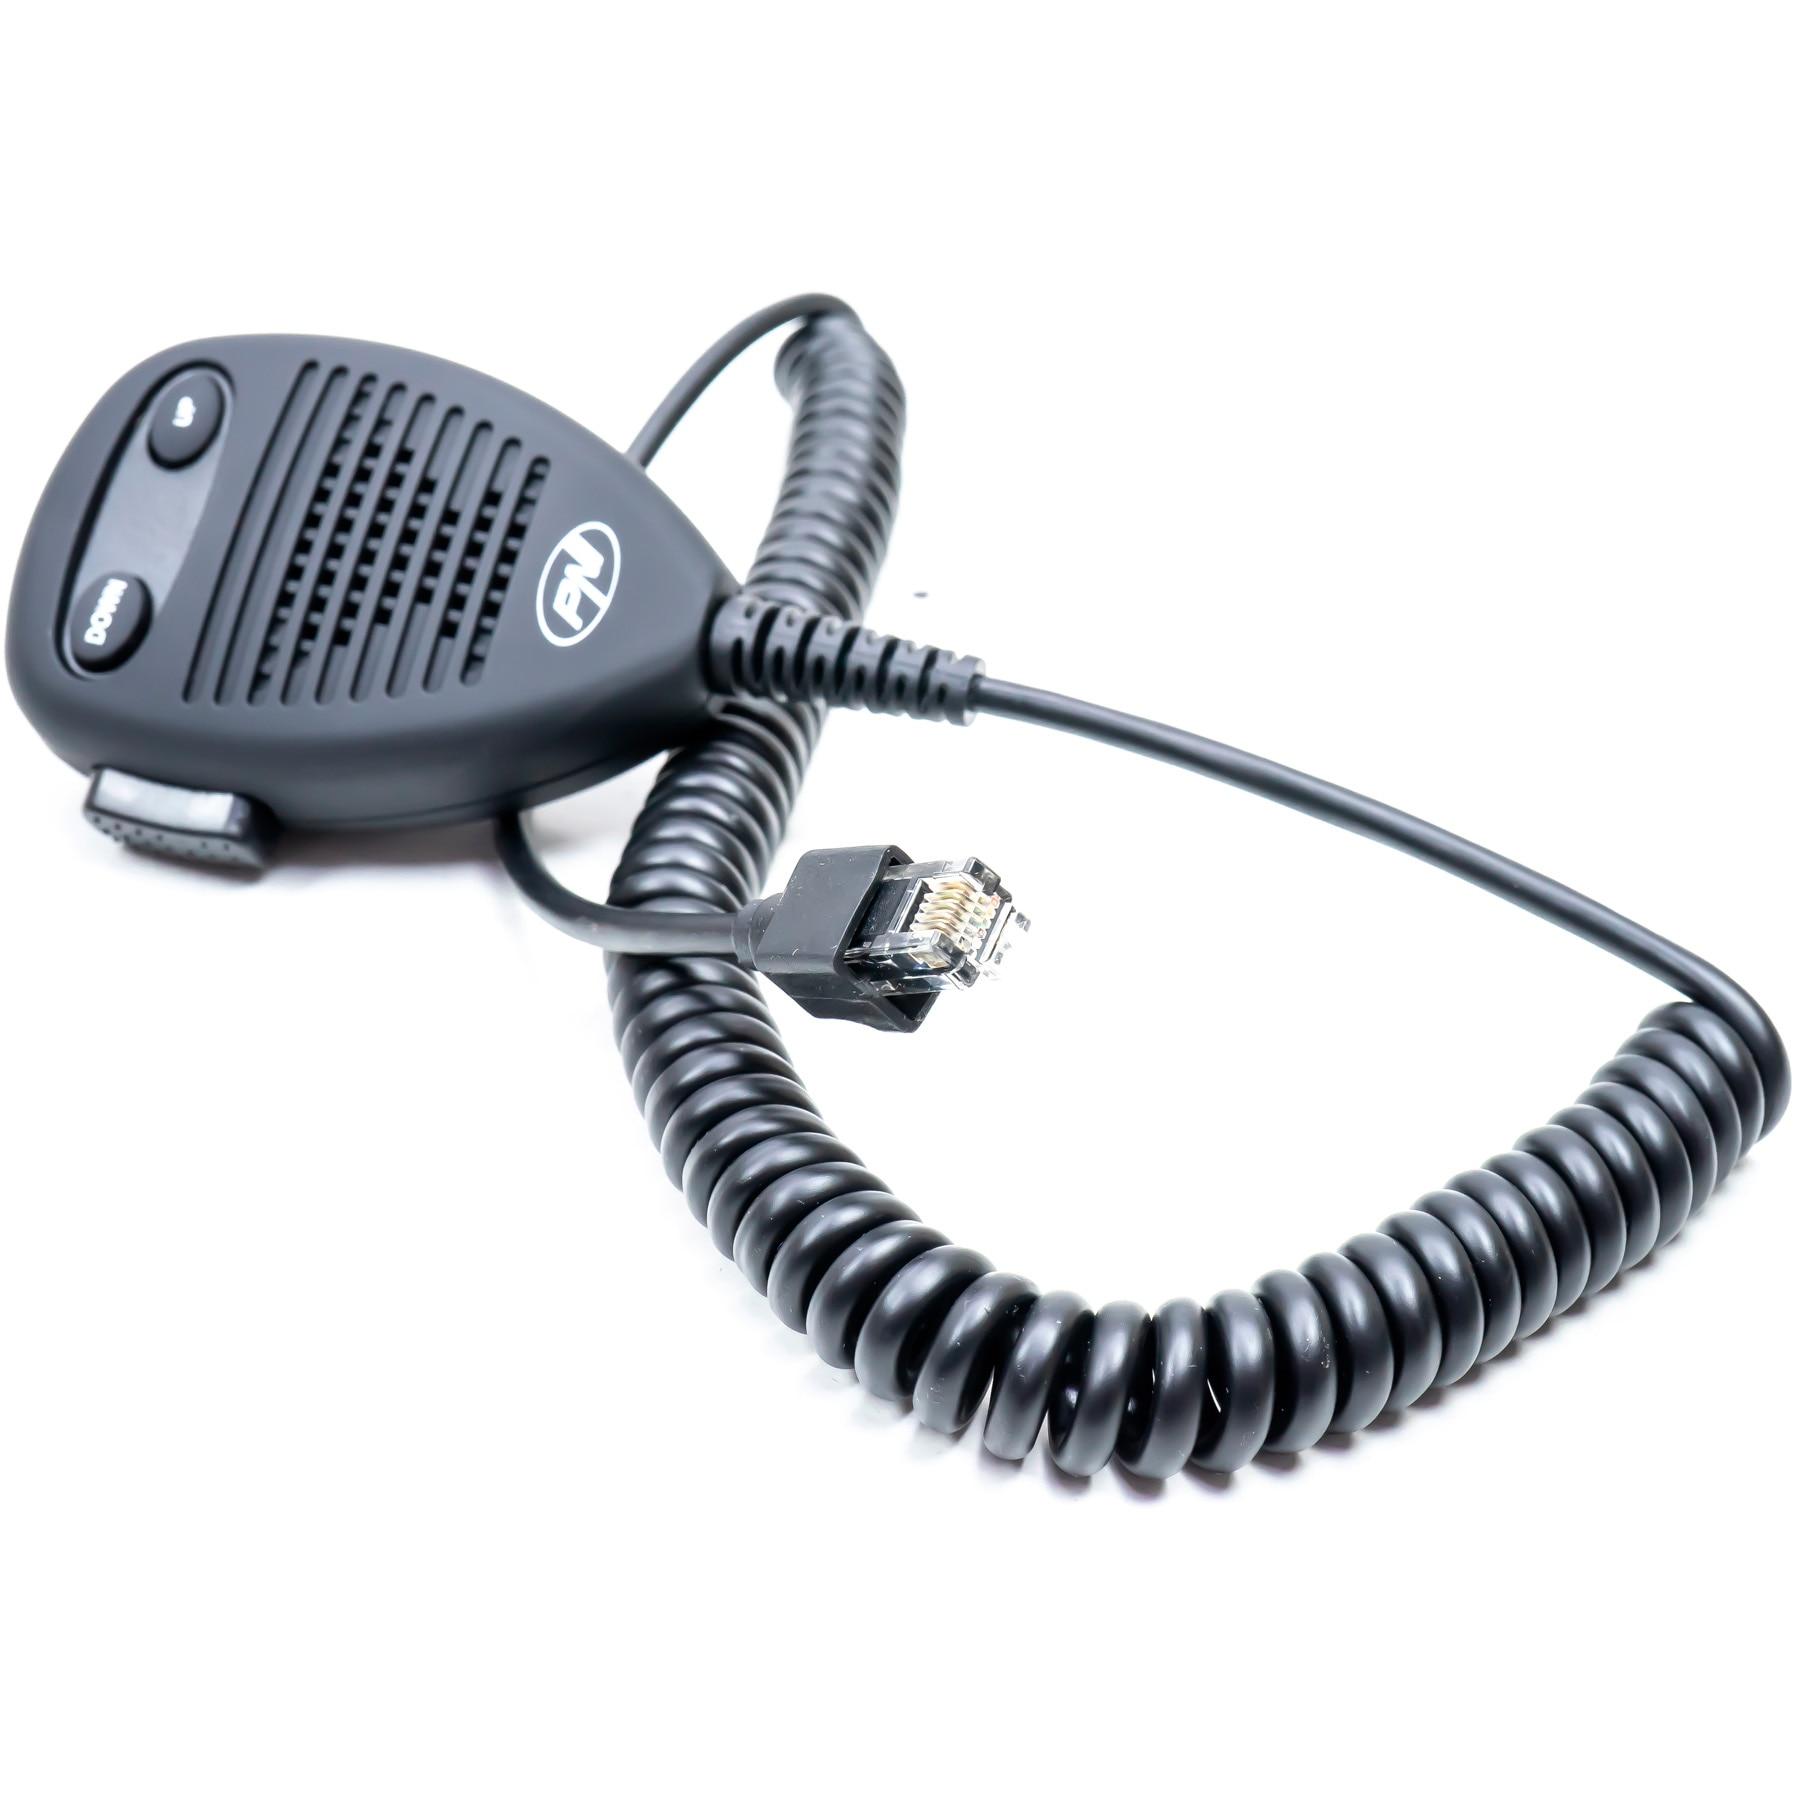 Fotografie Microfon de schimb pentru statiile radio CB PNI Escort HP 6500, PNI Escort HP 7120